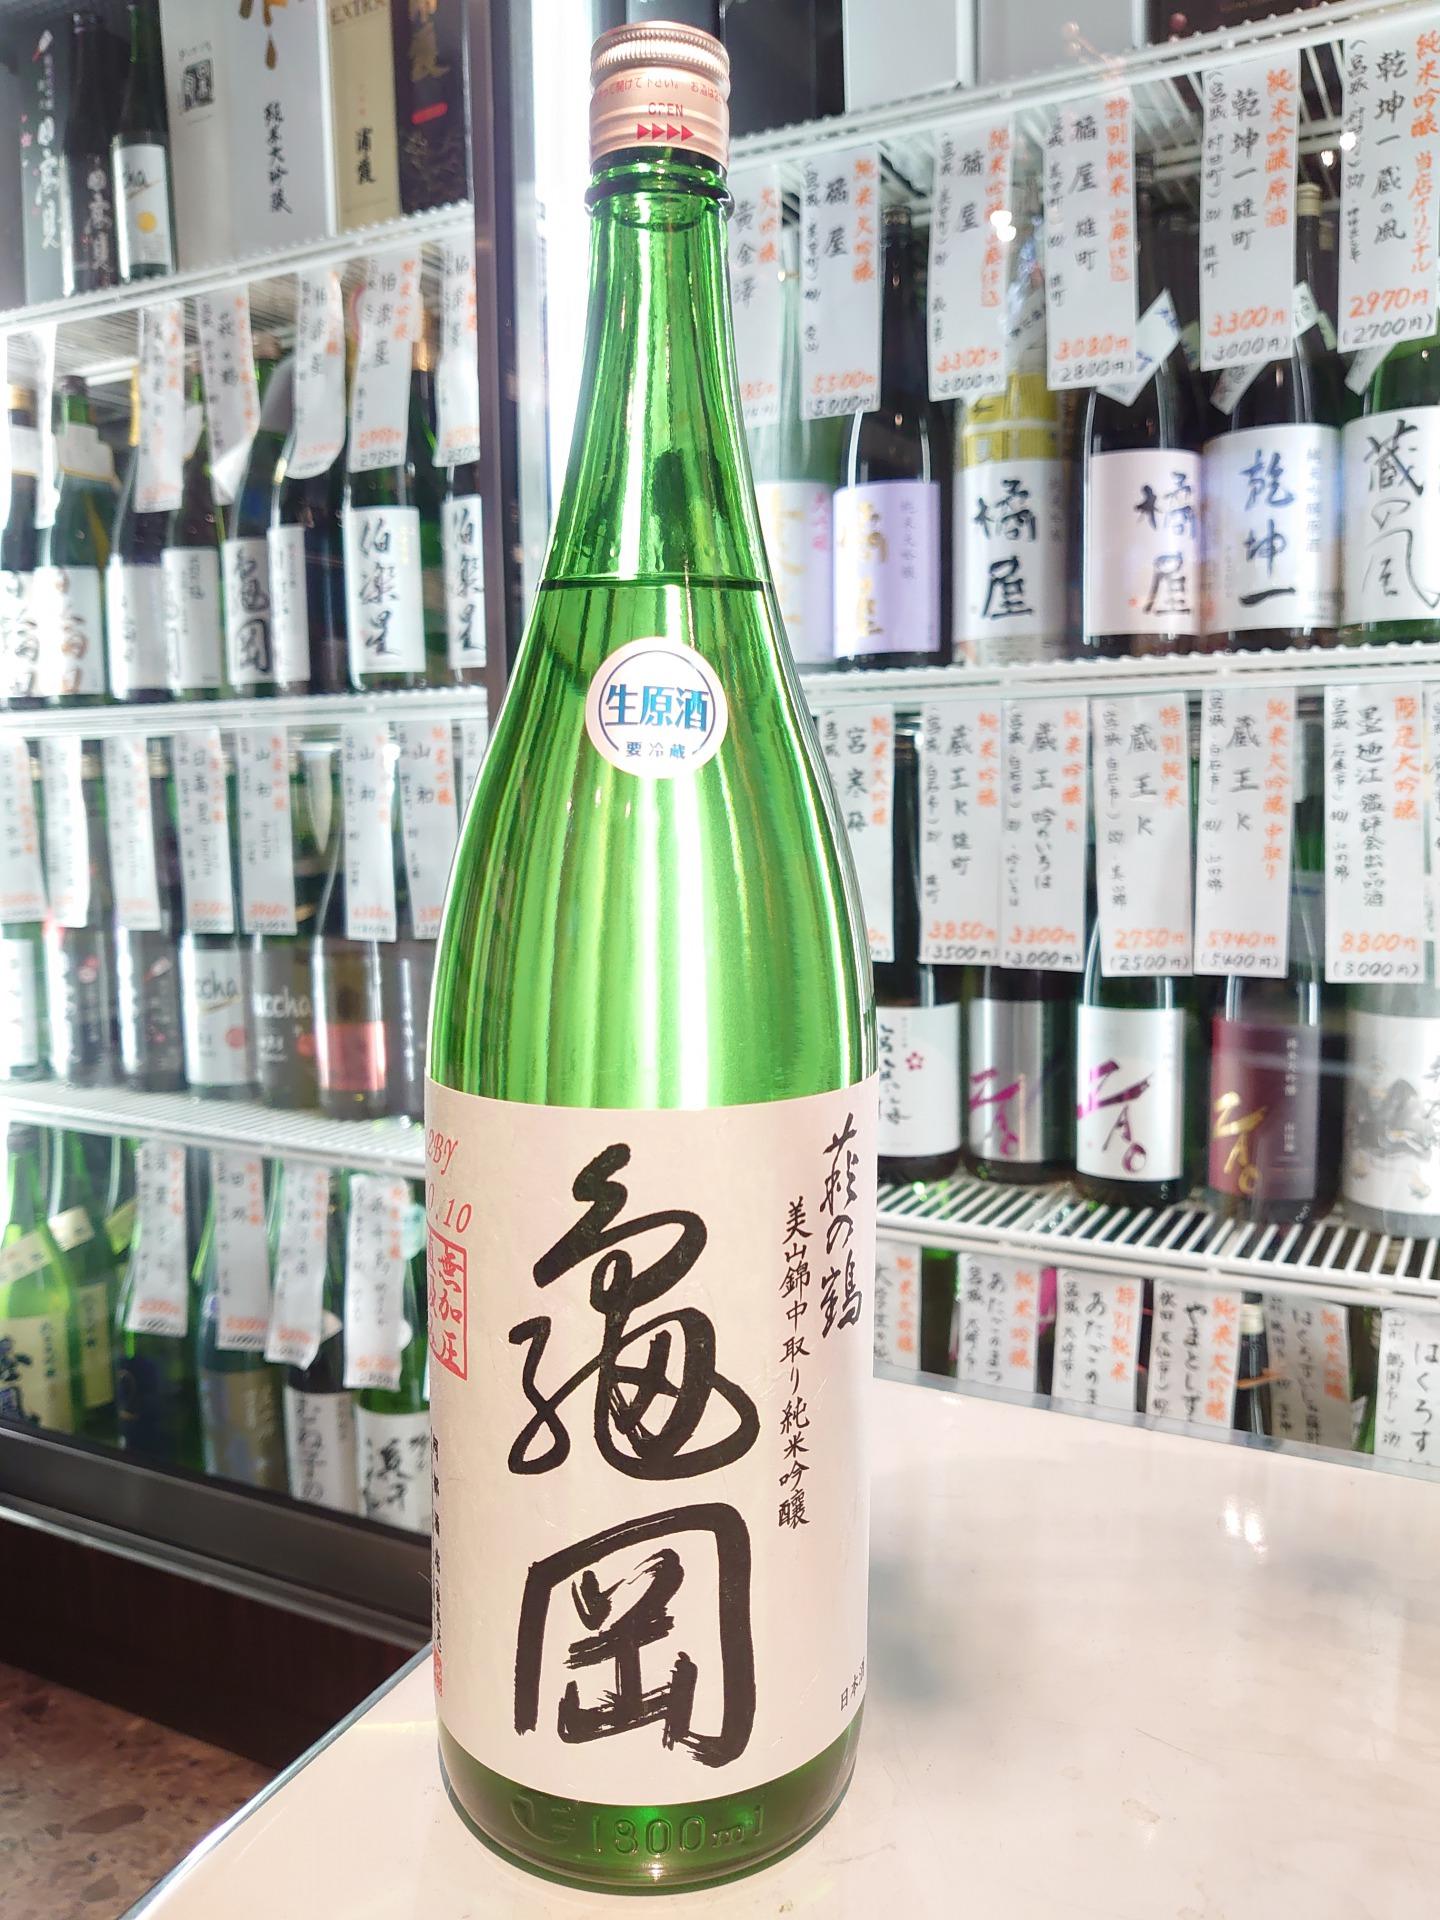 萩の鶴 中取り純米吟醸 生原酒 亀岡 無加圧直汲み 1.8L